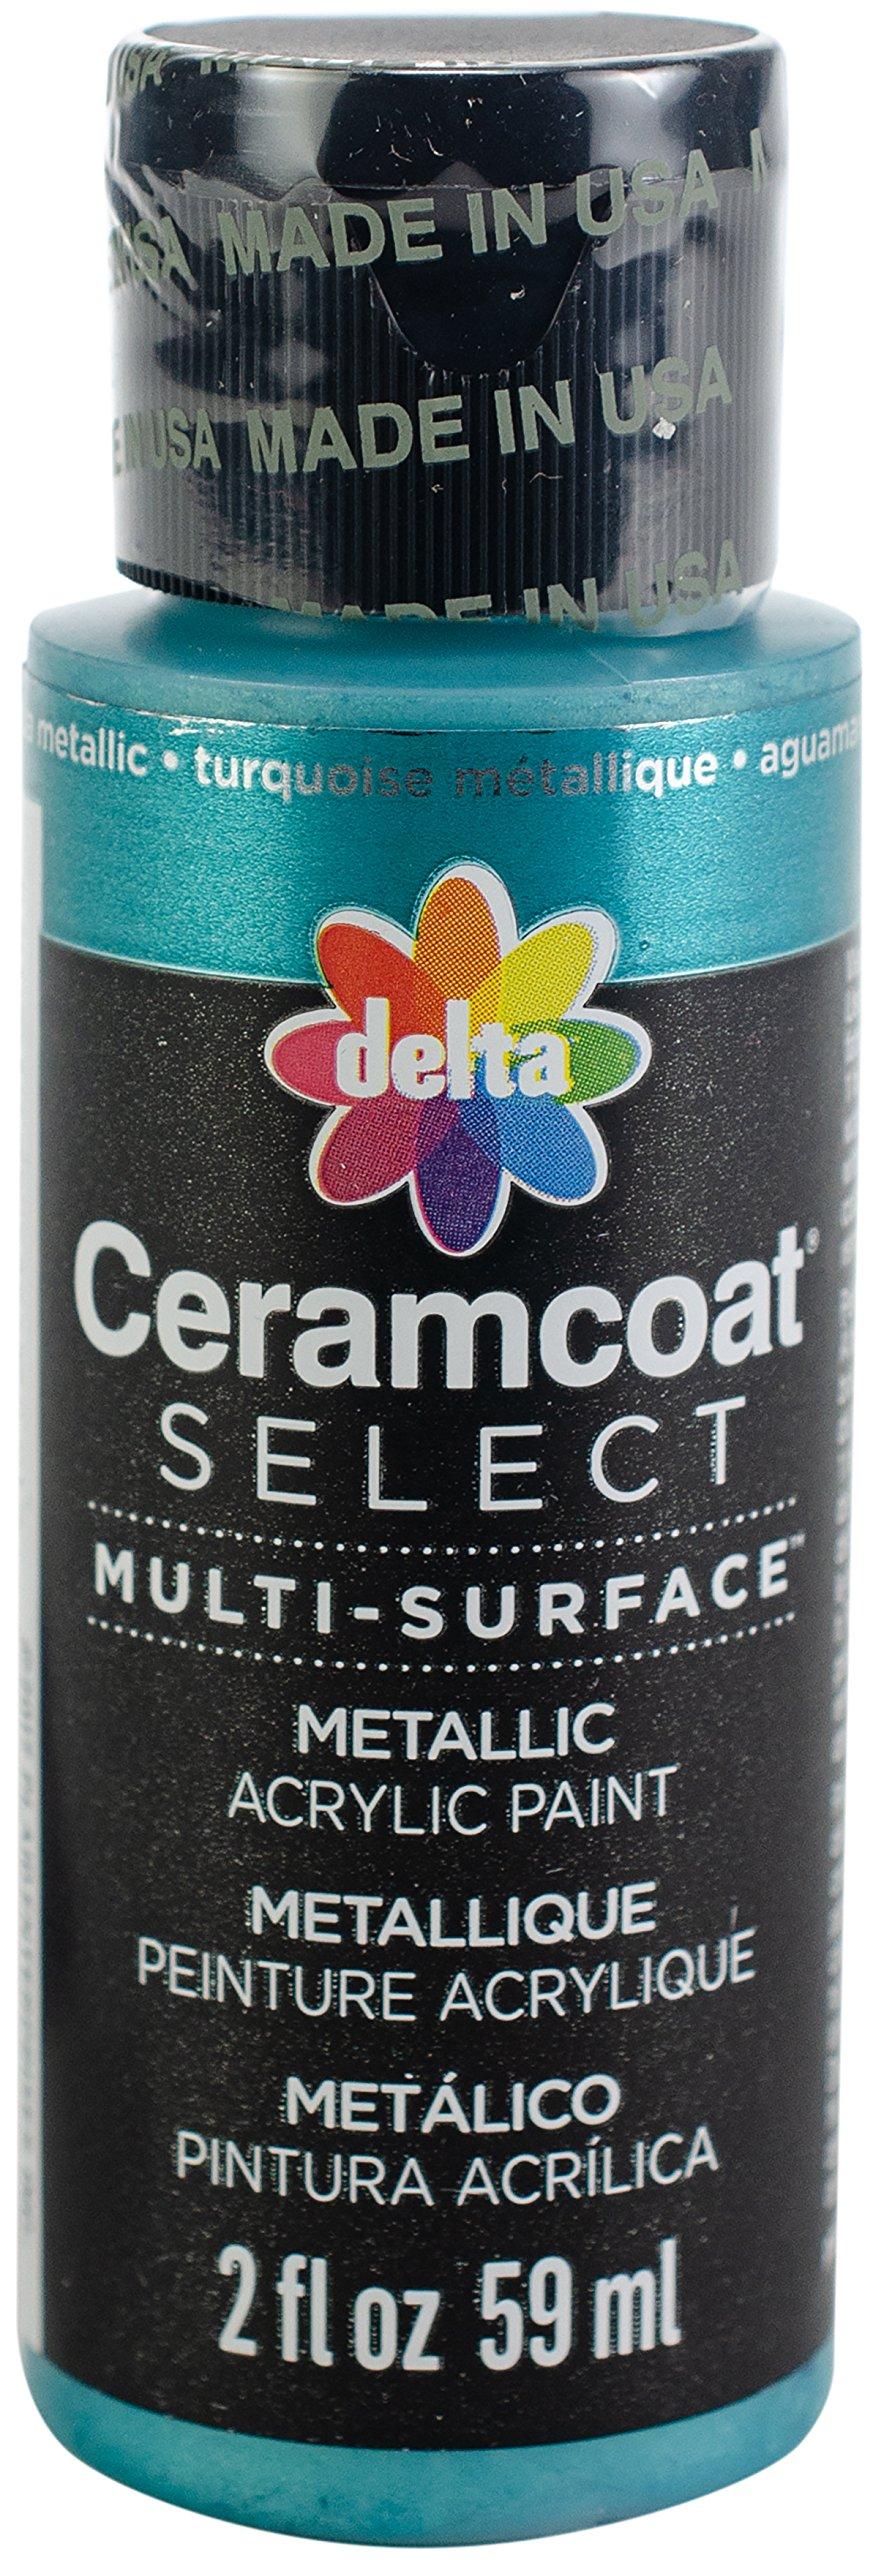 Delta Creative 04103 Multi-Surface Paint, 2 oz, Aqua Metallic